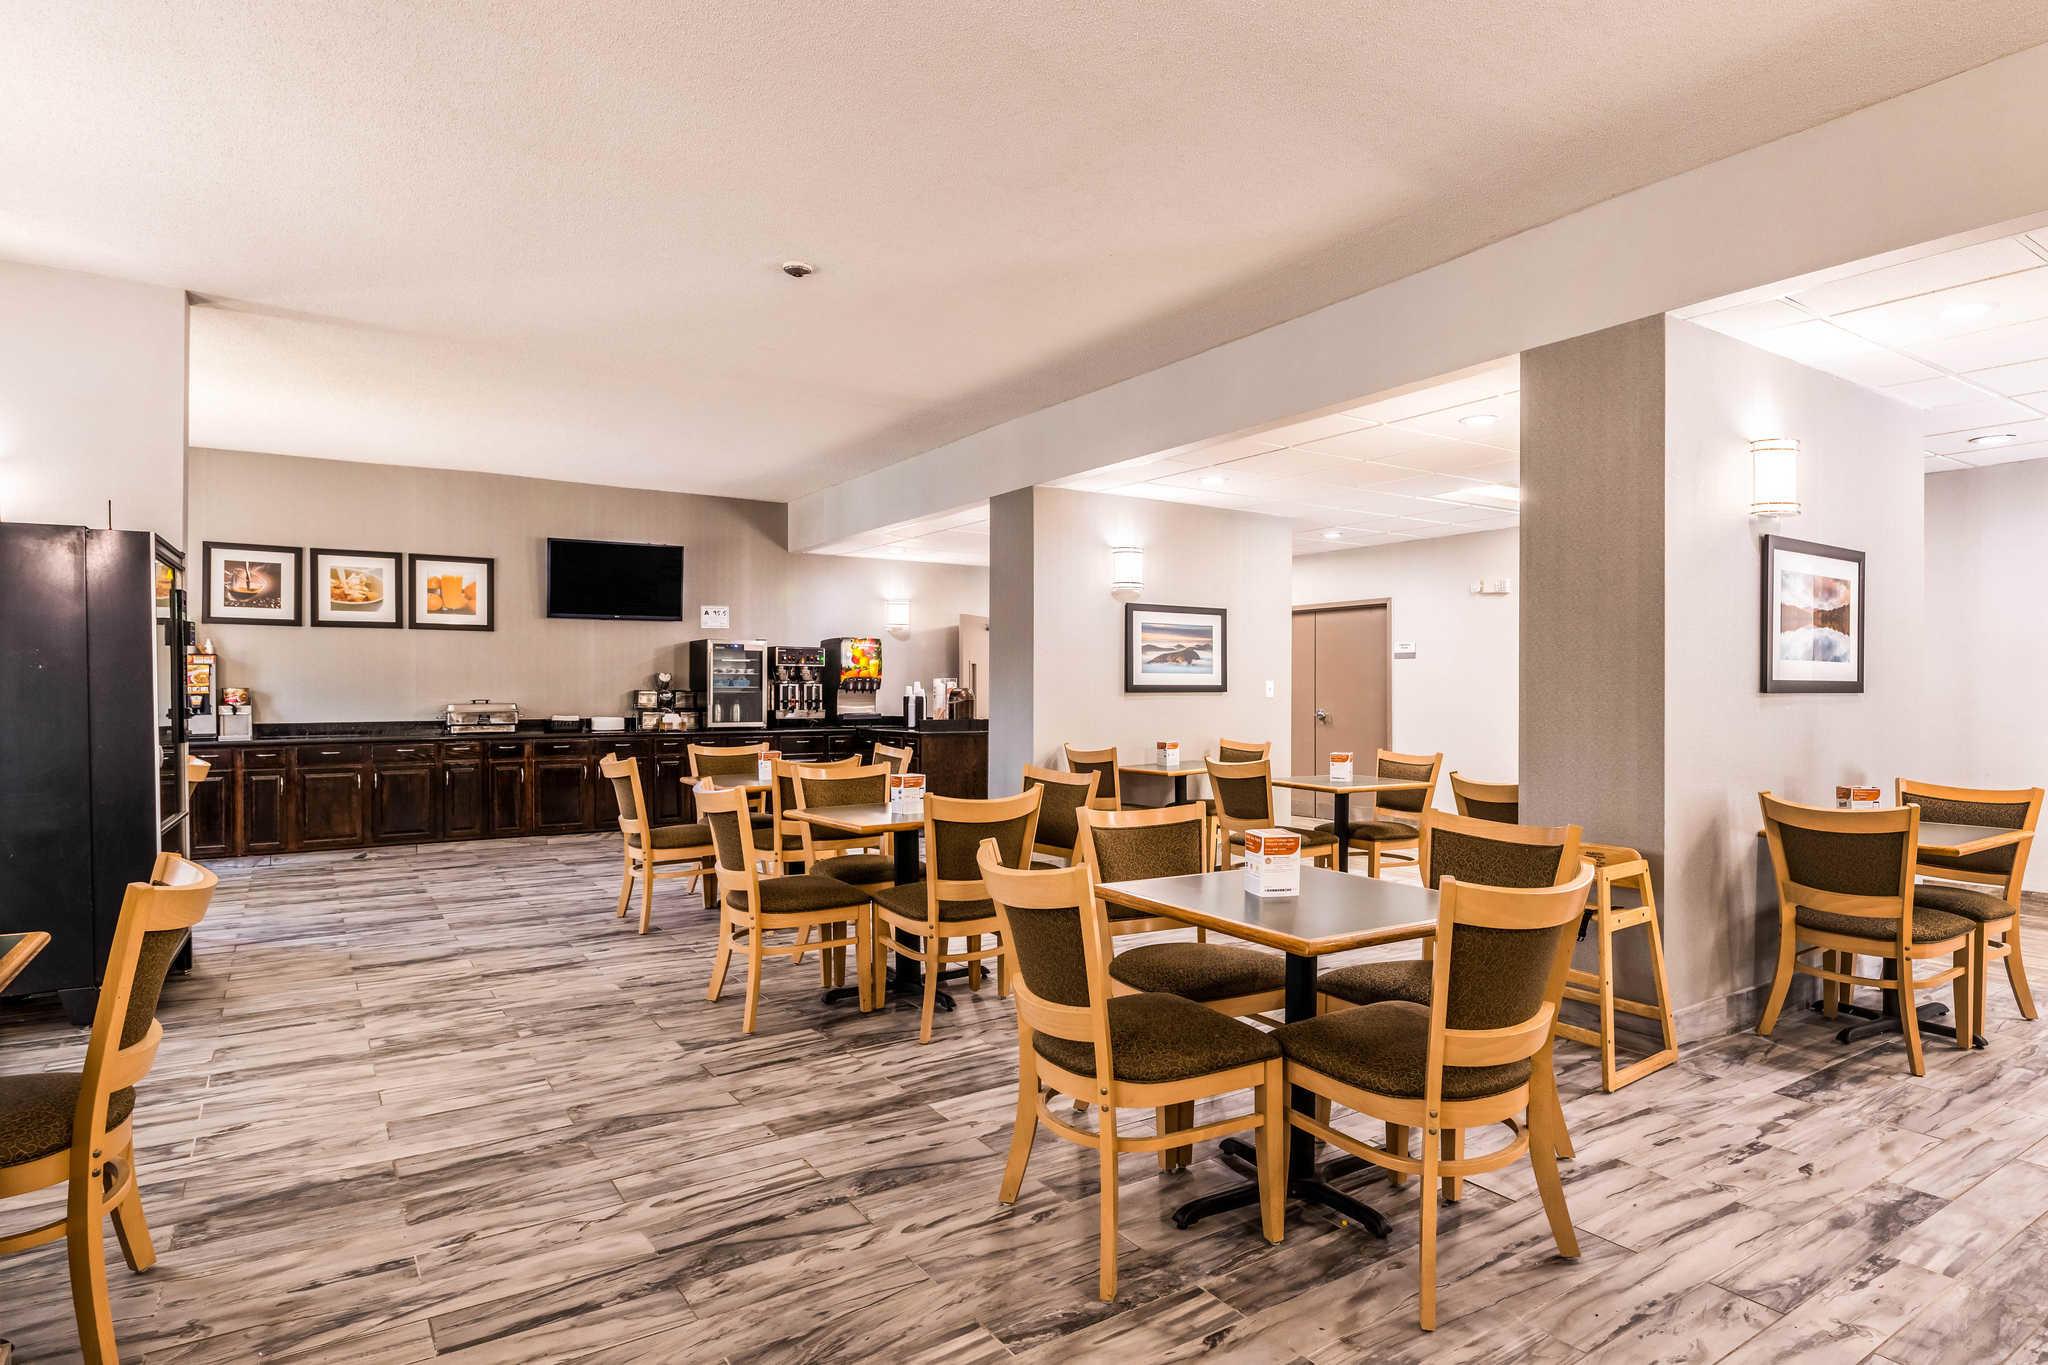 Clarion Inn & Suites image 38